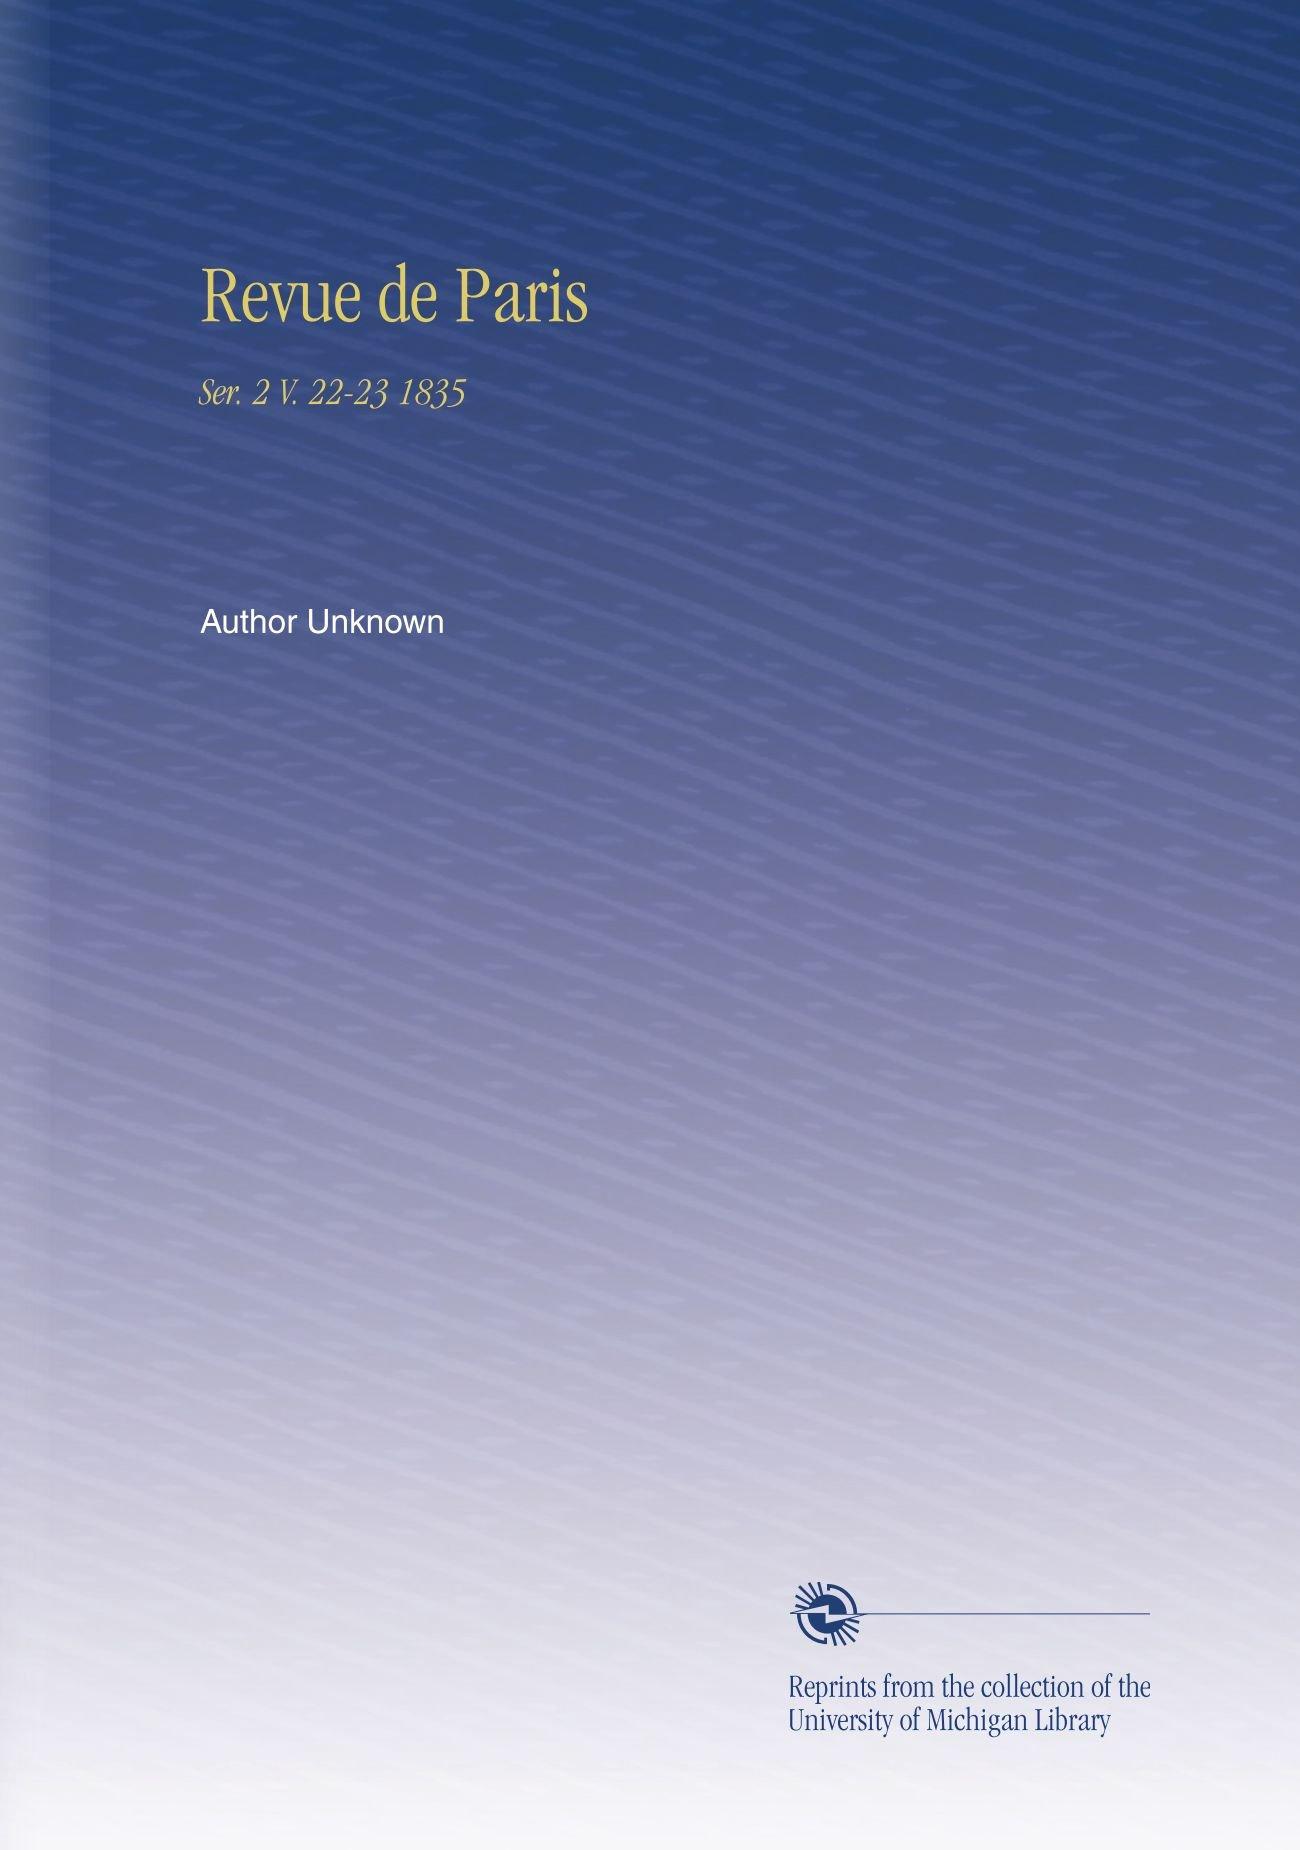 Download Revue de Paris: Ser. 2 V. 22-23 1835 (French Edition) ebook